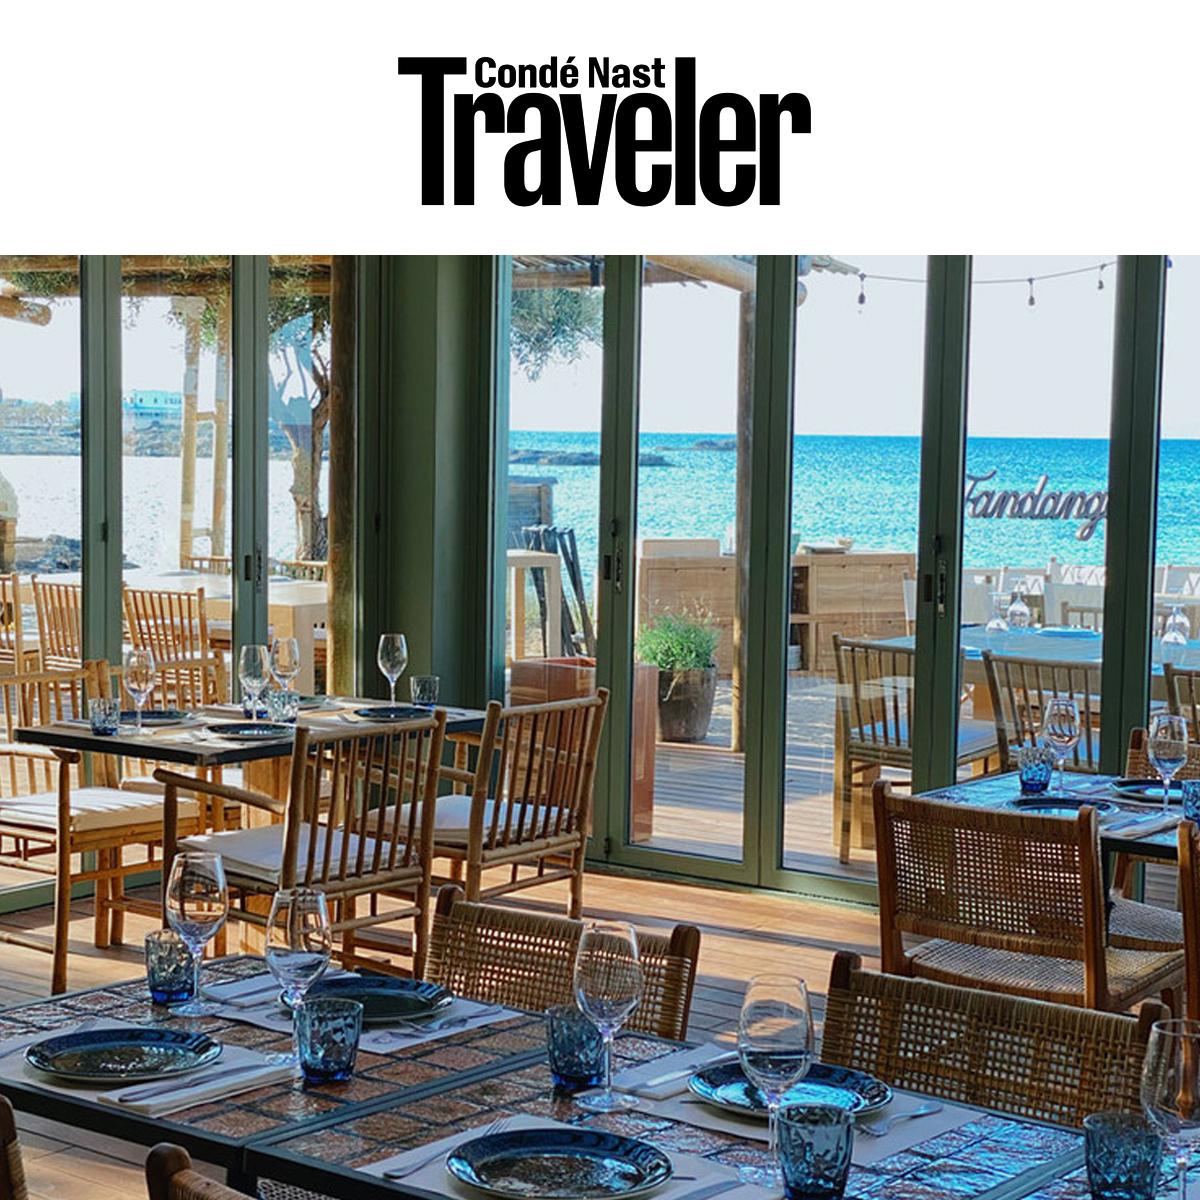 Condé Nast Traveller